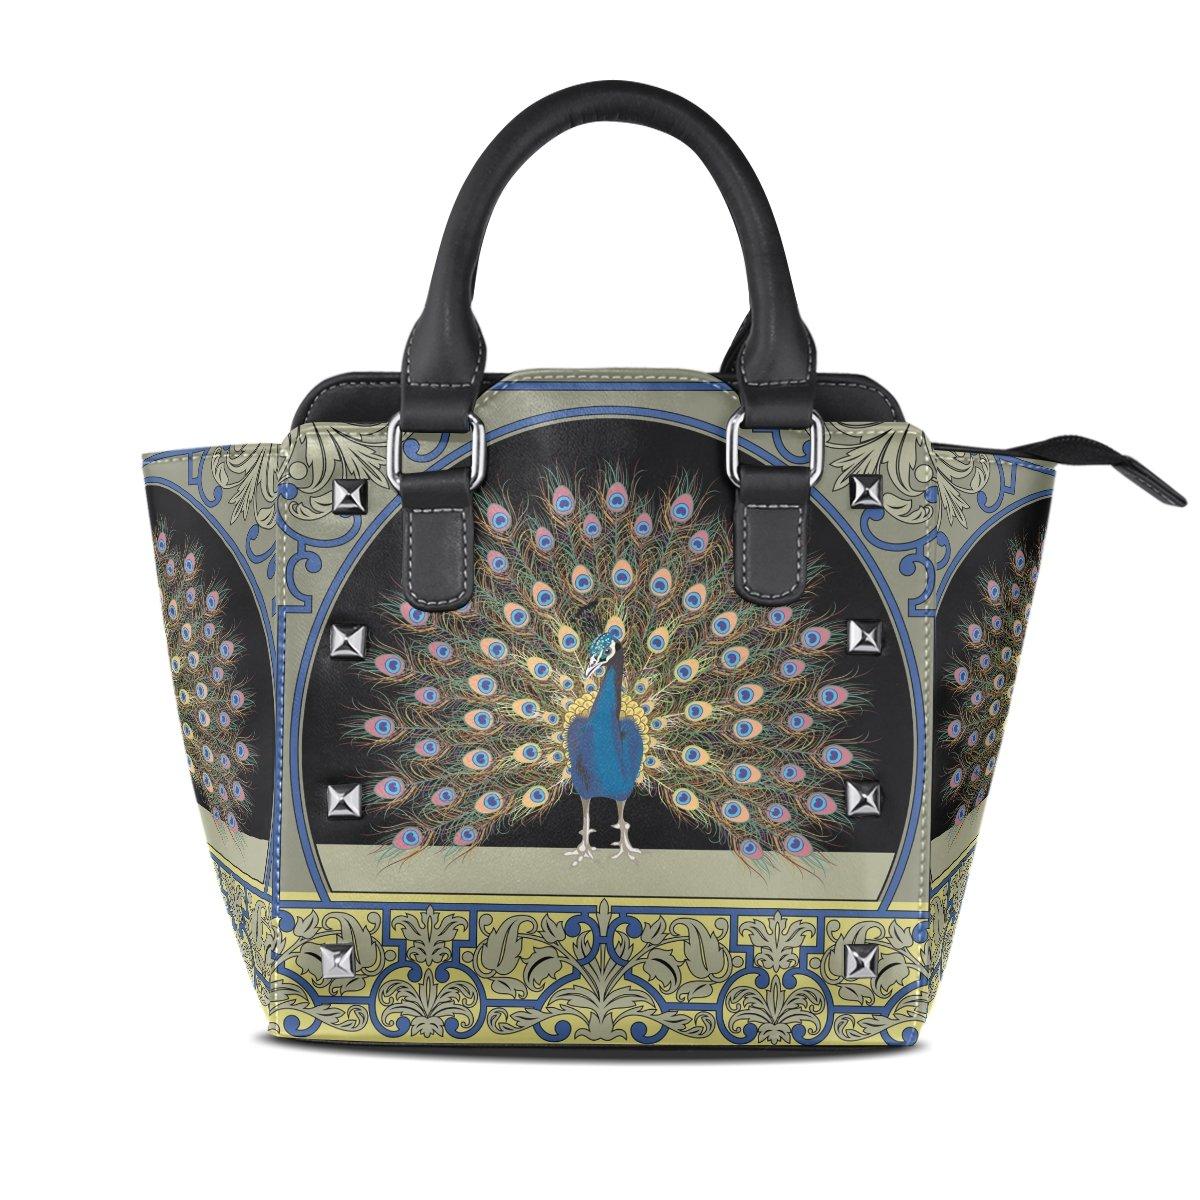 Ladies Genuine Leather Tote Bags Beayty Peacock Womens Hangbags Shoulder Bags